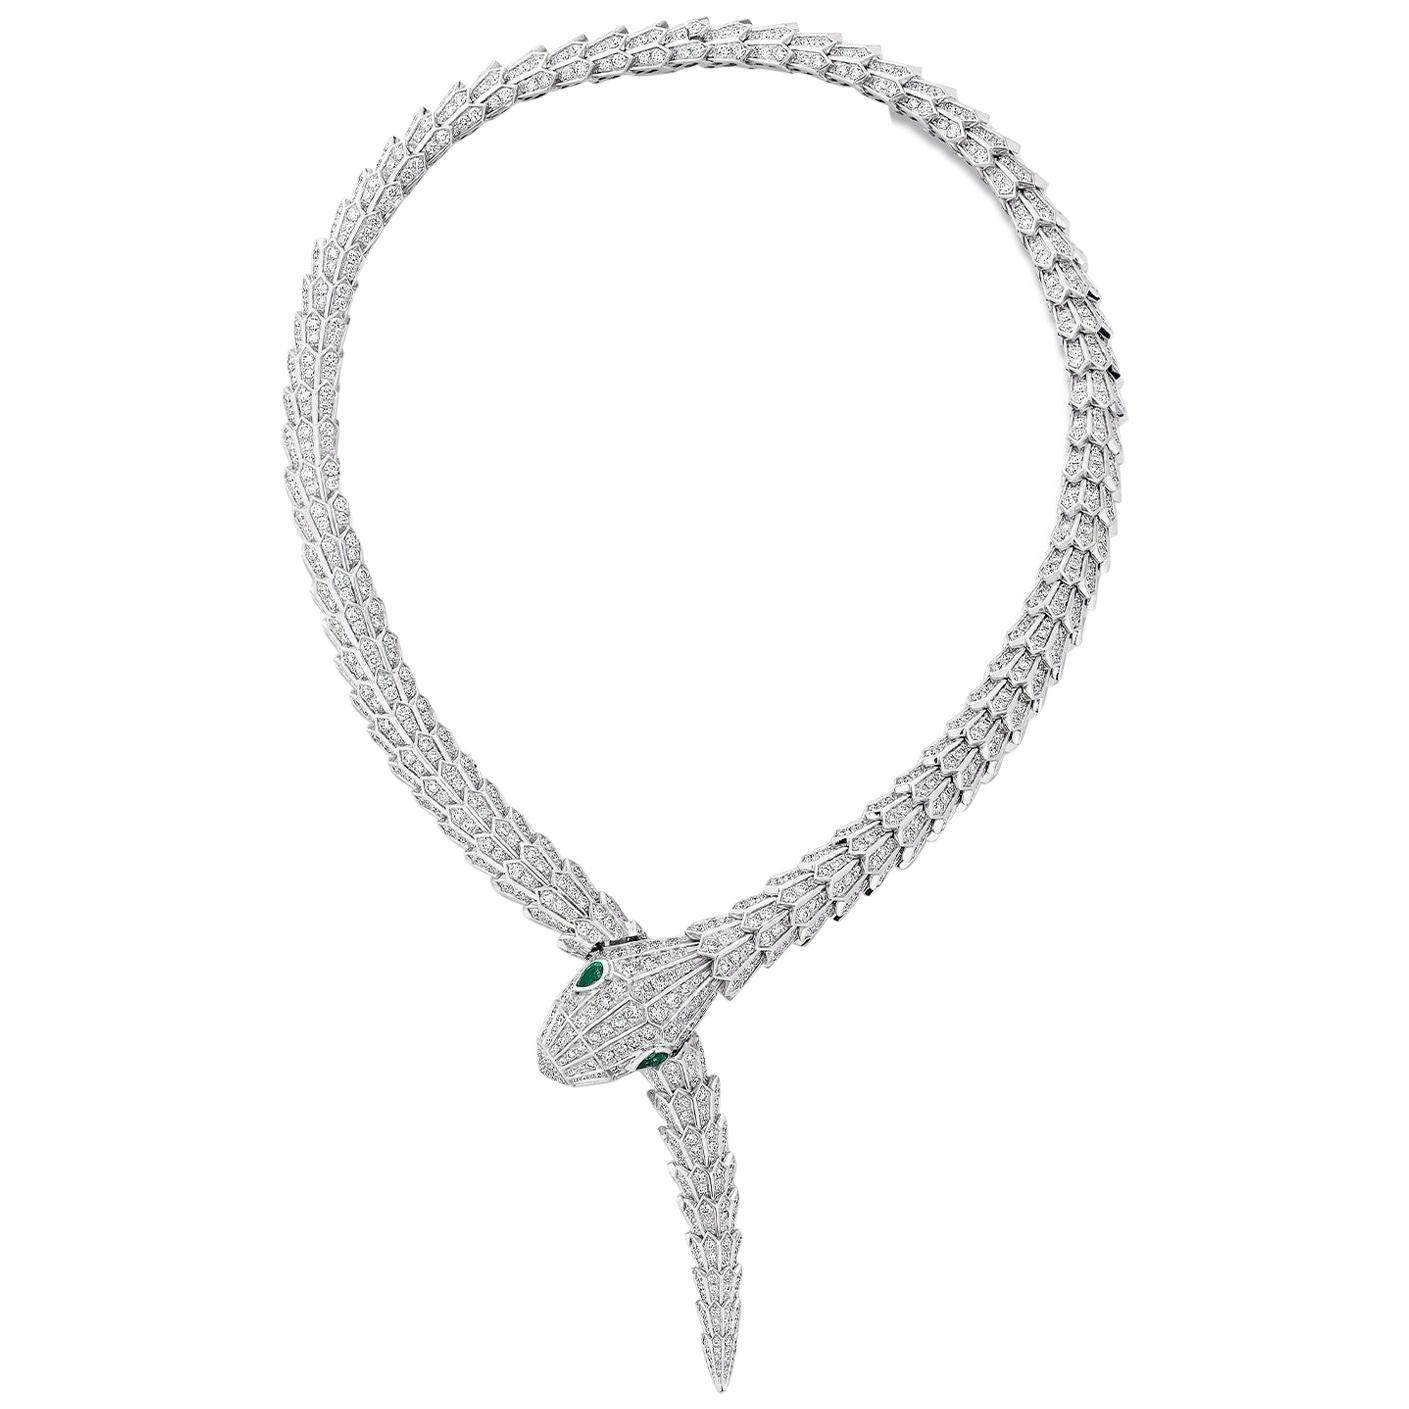 Serpenti Necklace